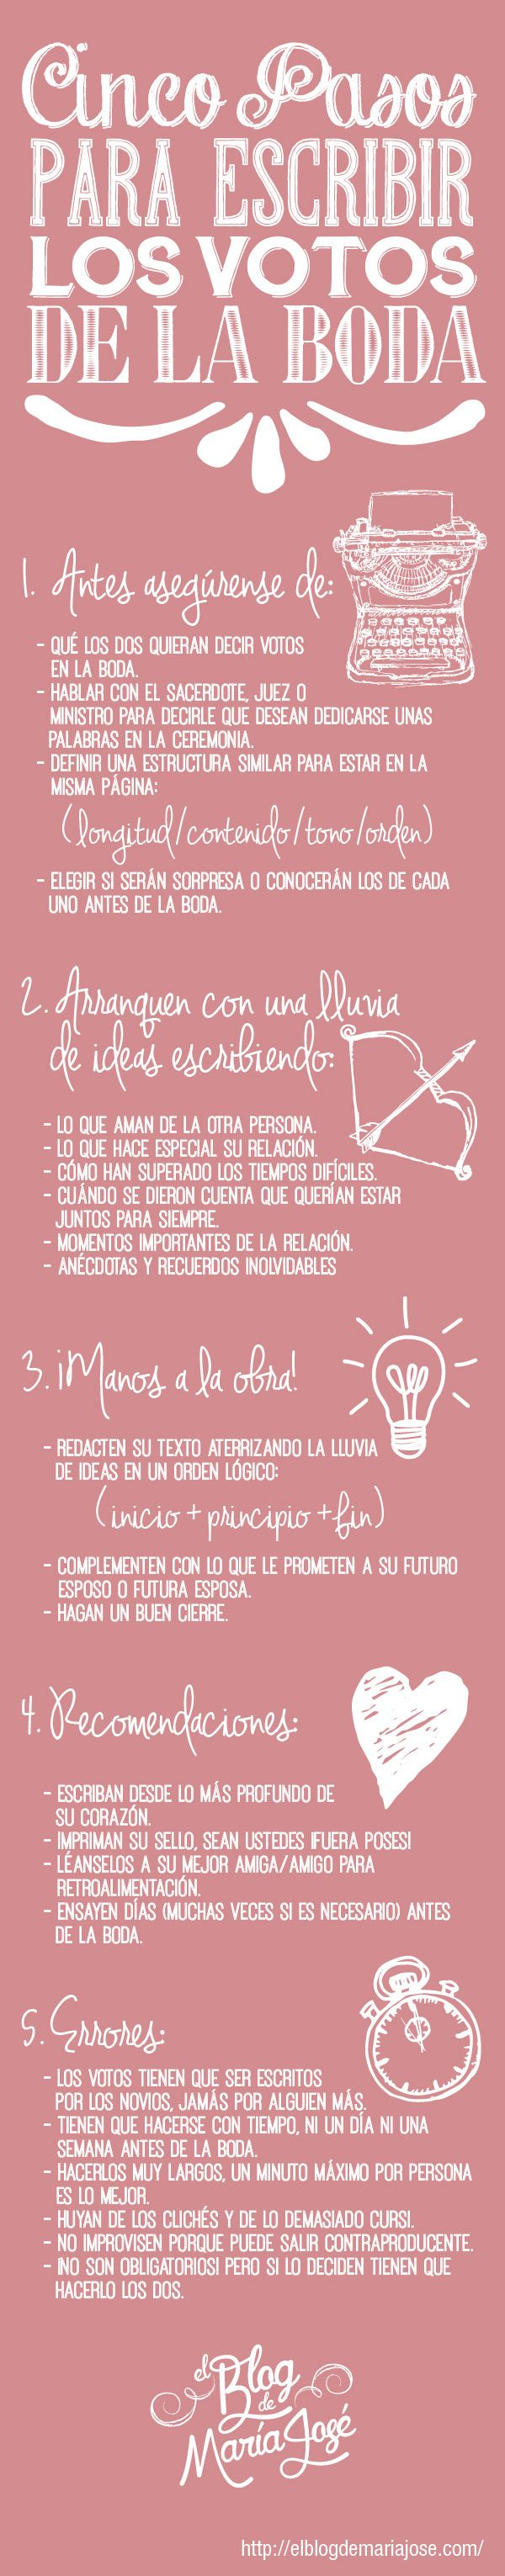 Ideas para tu Boda http://bodaydecoracion.com/ideas/